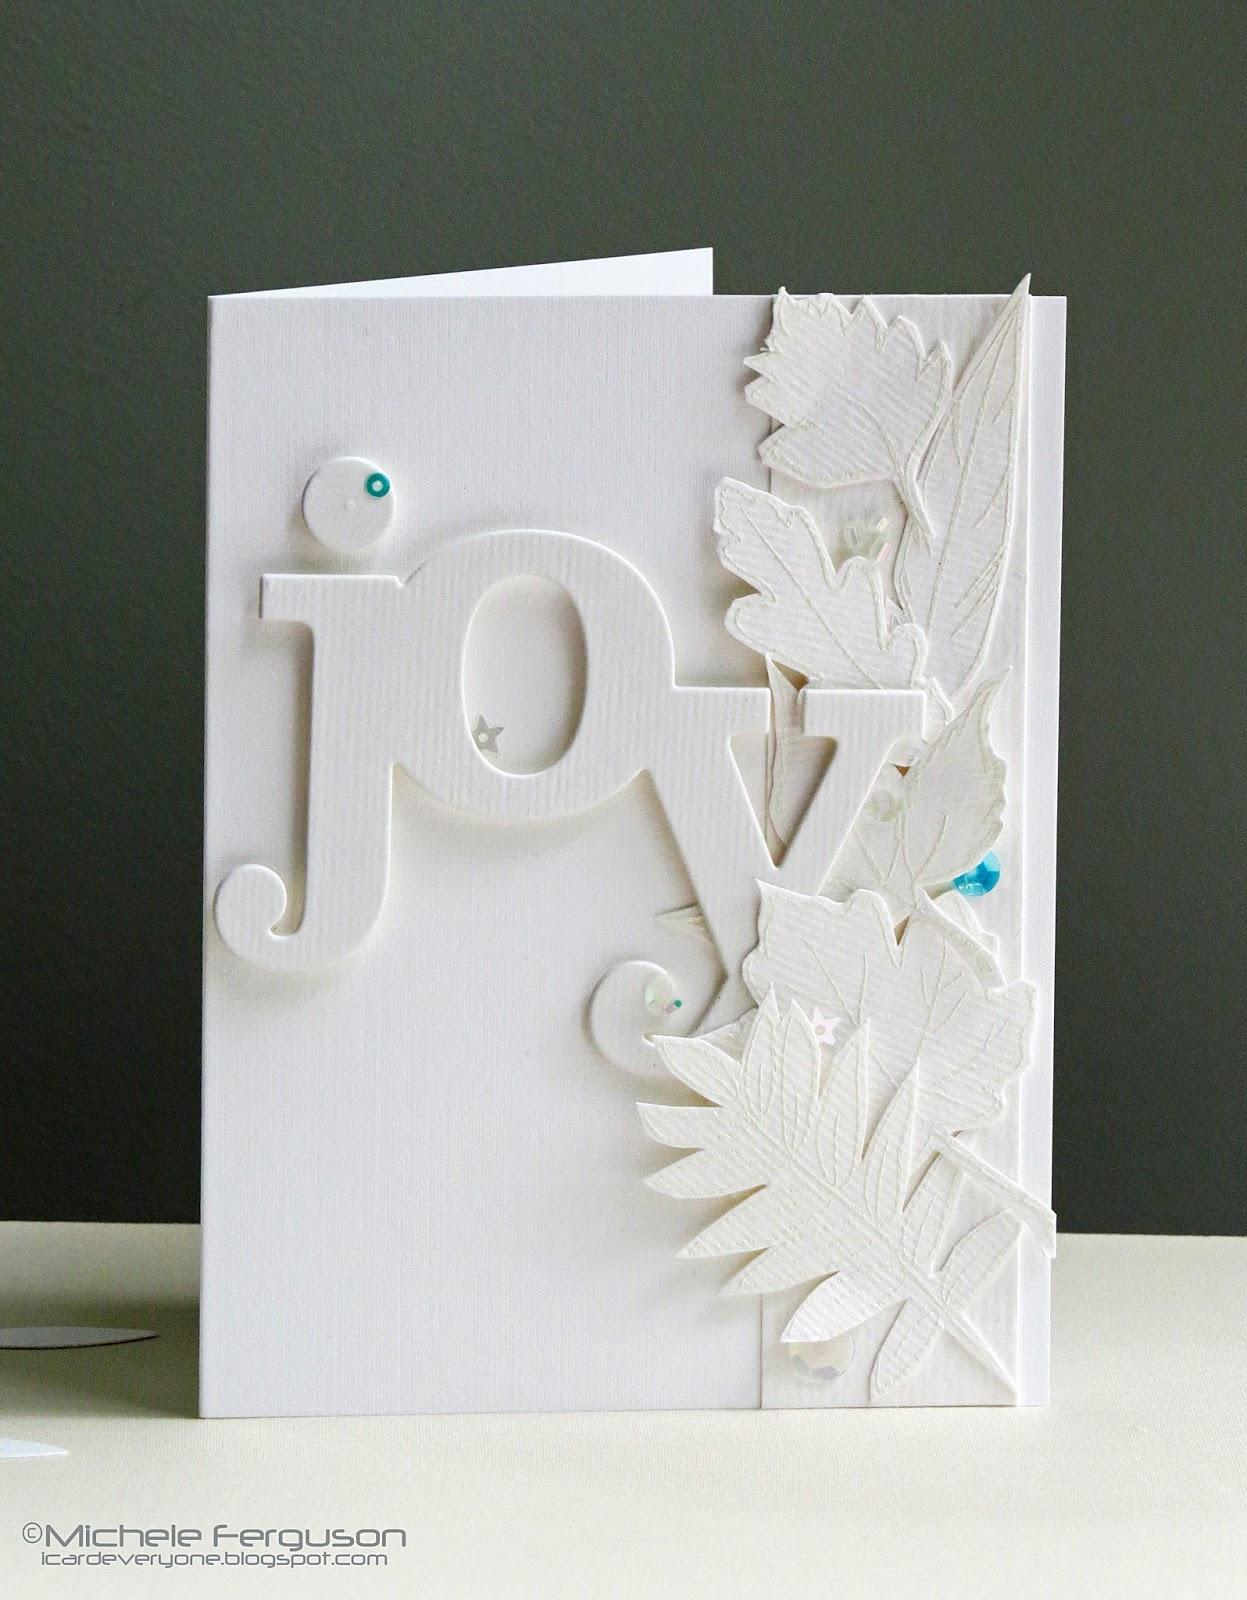 michele_WWLL wk4 Joy